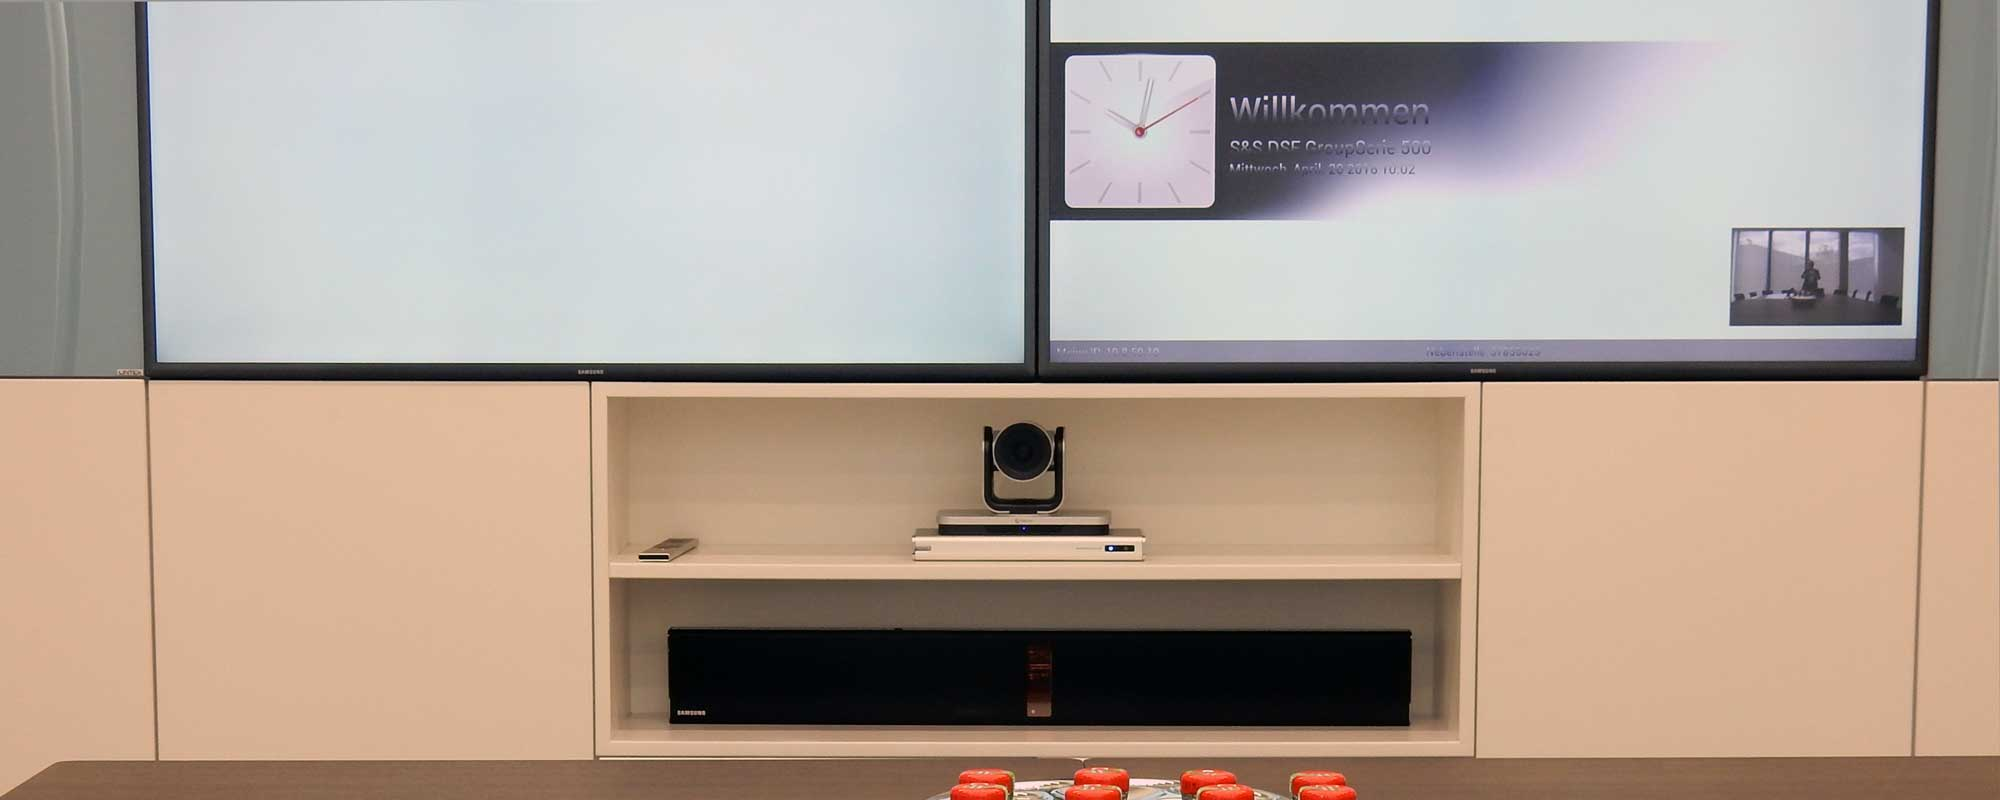 Videokonferenzsystem Polycom RealPresence Group mit 85 Zoll Monitor individuell angepasster Wandhalterung und Soundbar - SkyOffice Düsseldorf 11. Etage